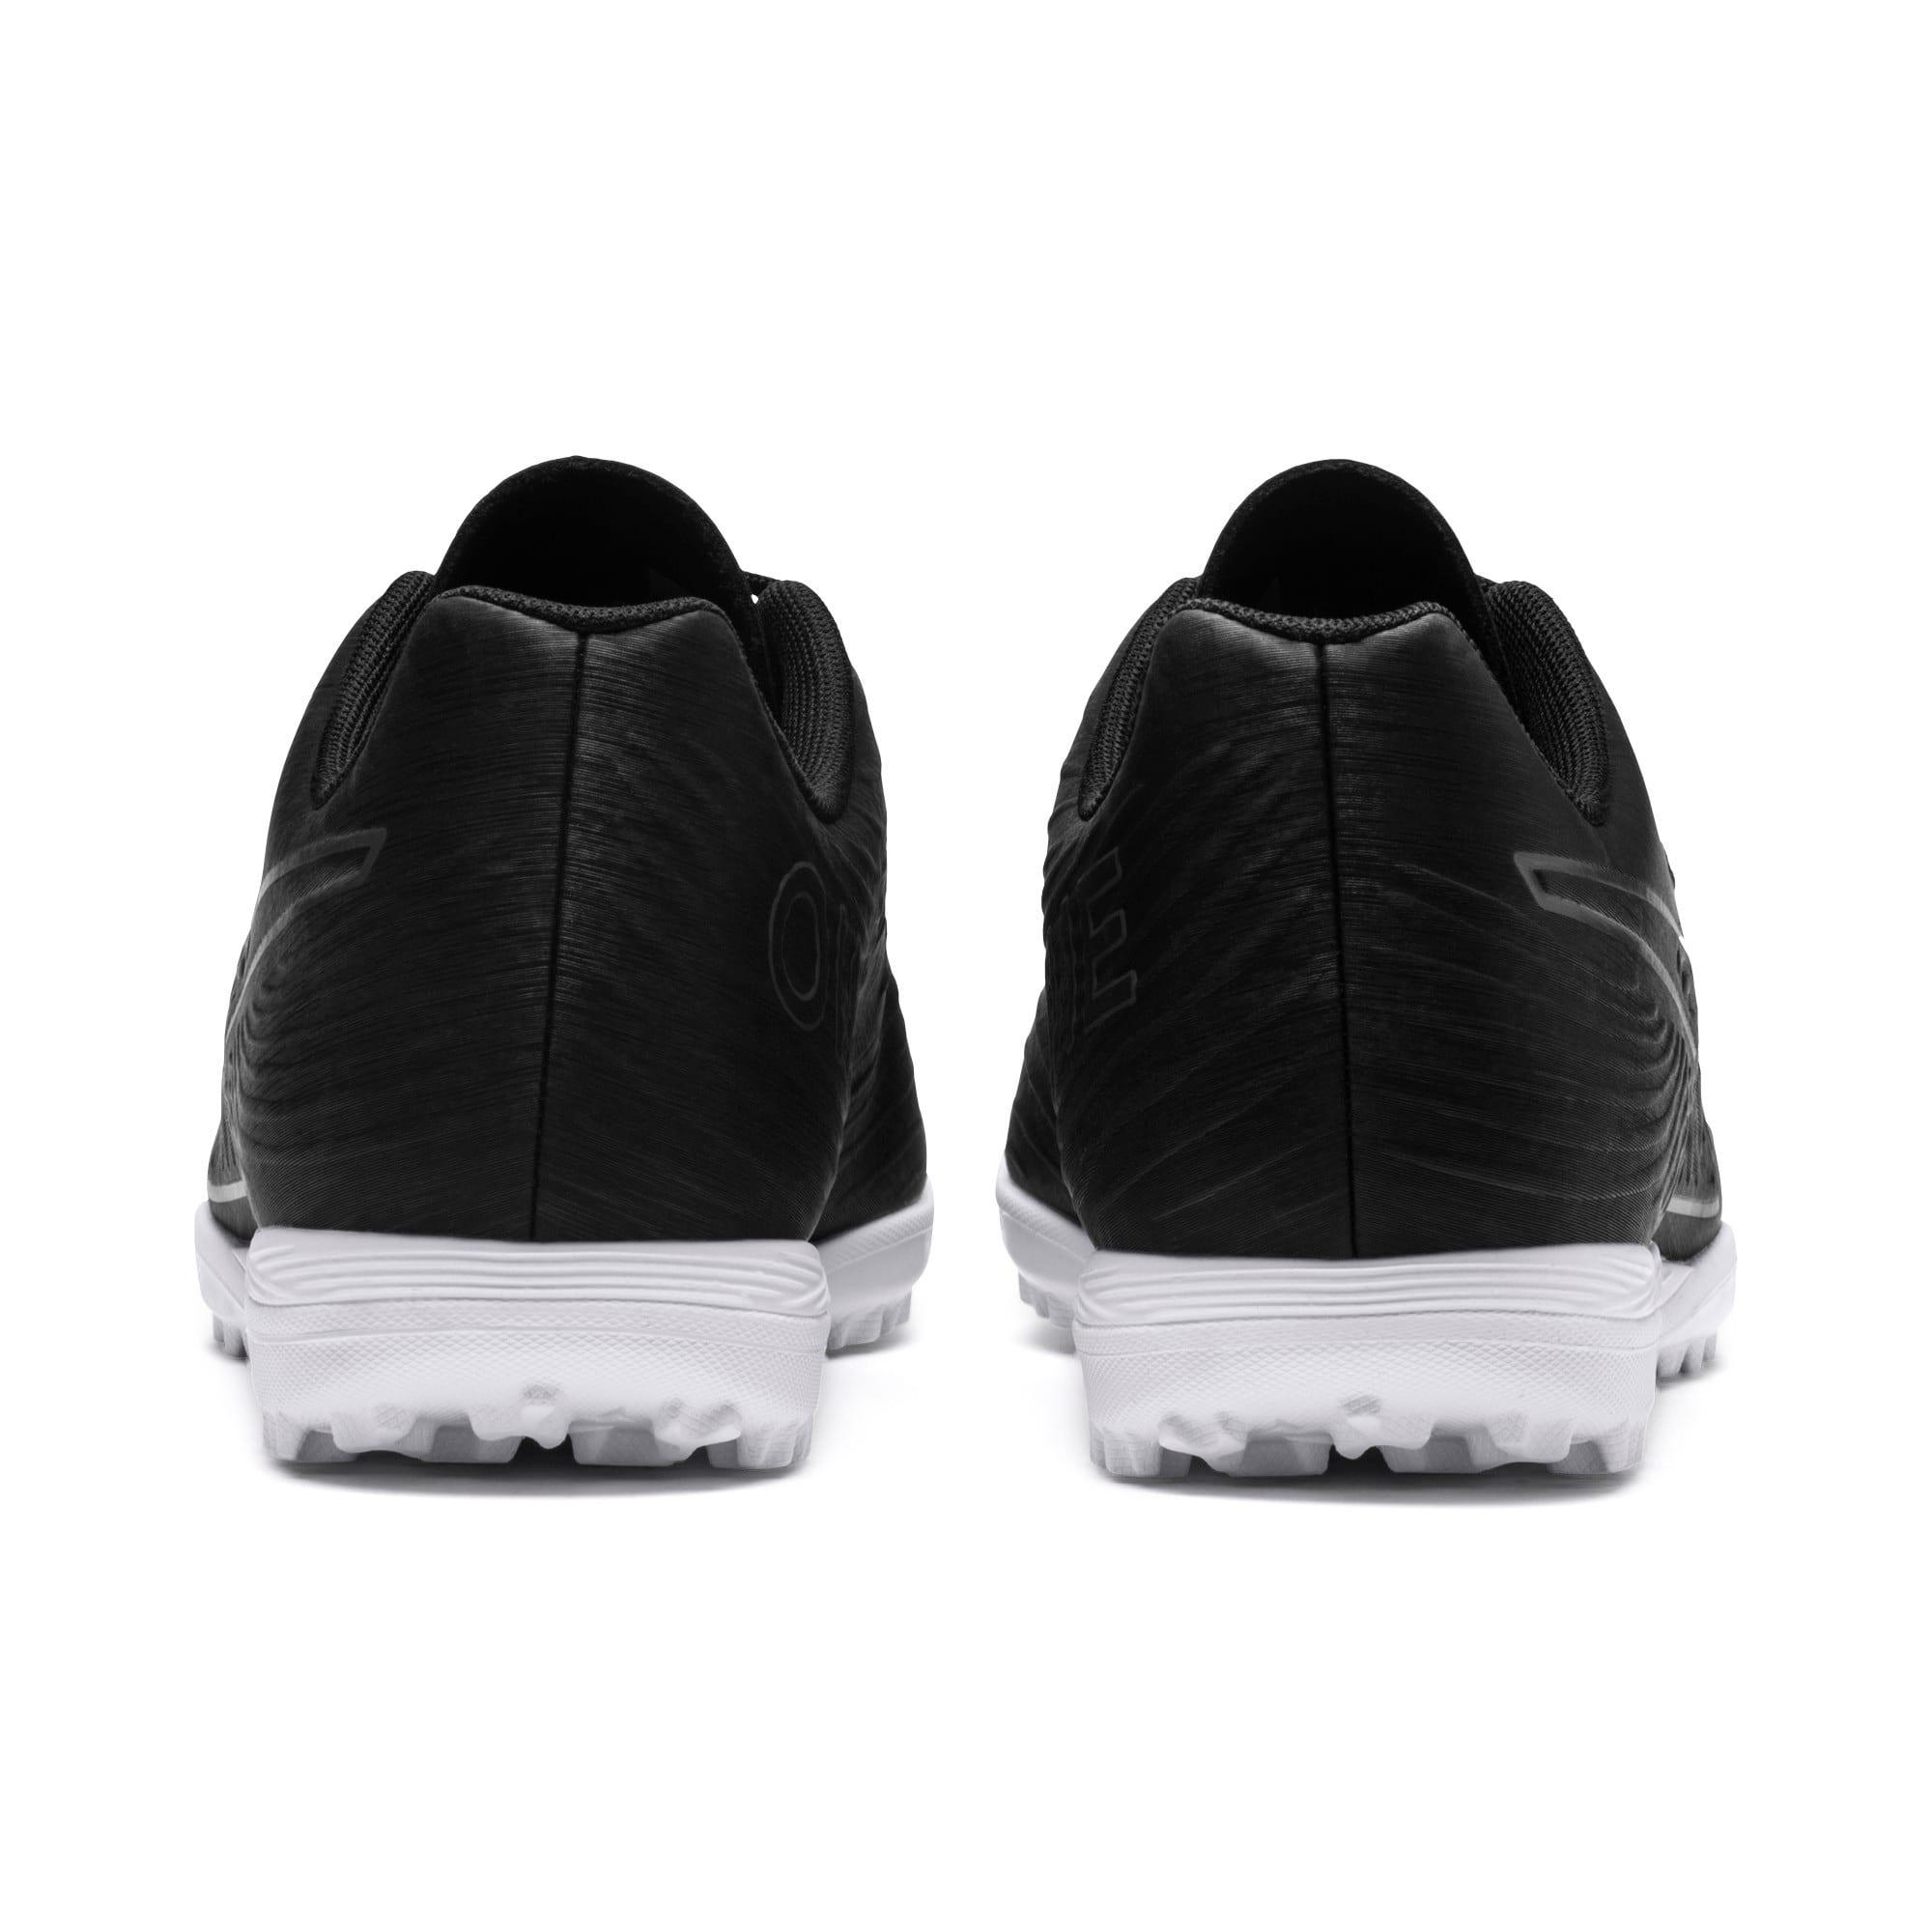 Thumbnail 3 of PUMA ONE 19.4 TT Men's Soccer Shoes, Puma Black-Puma Black-White, medium